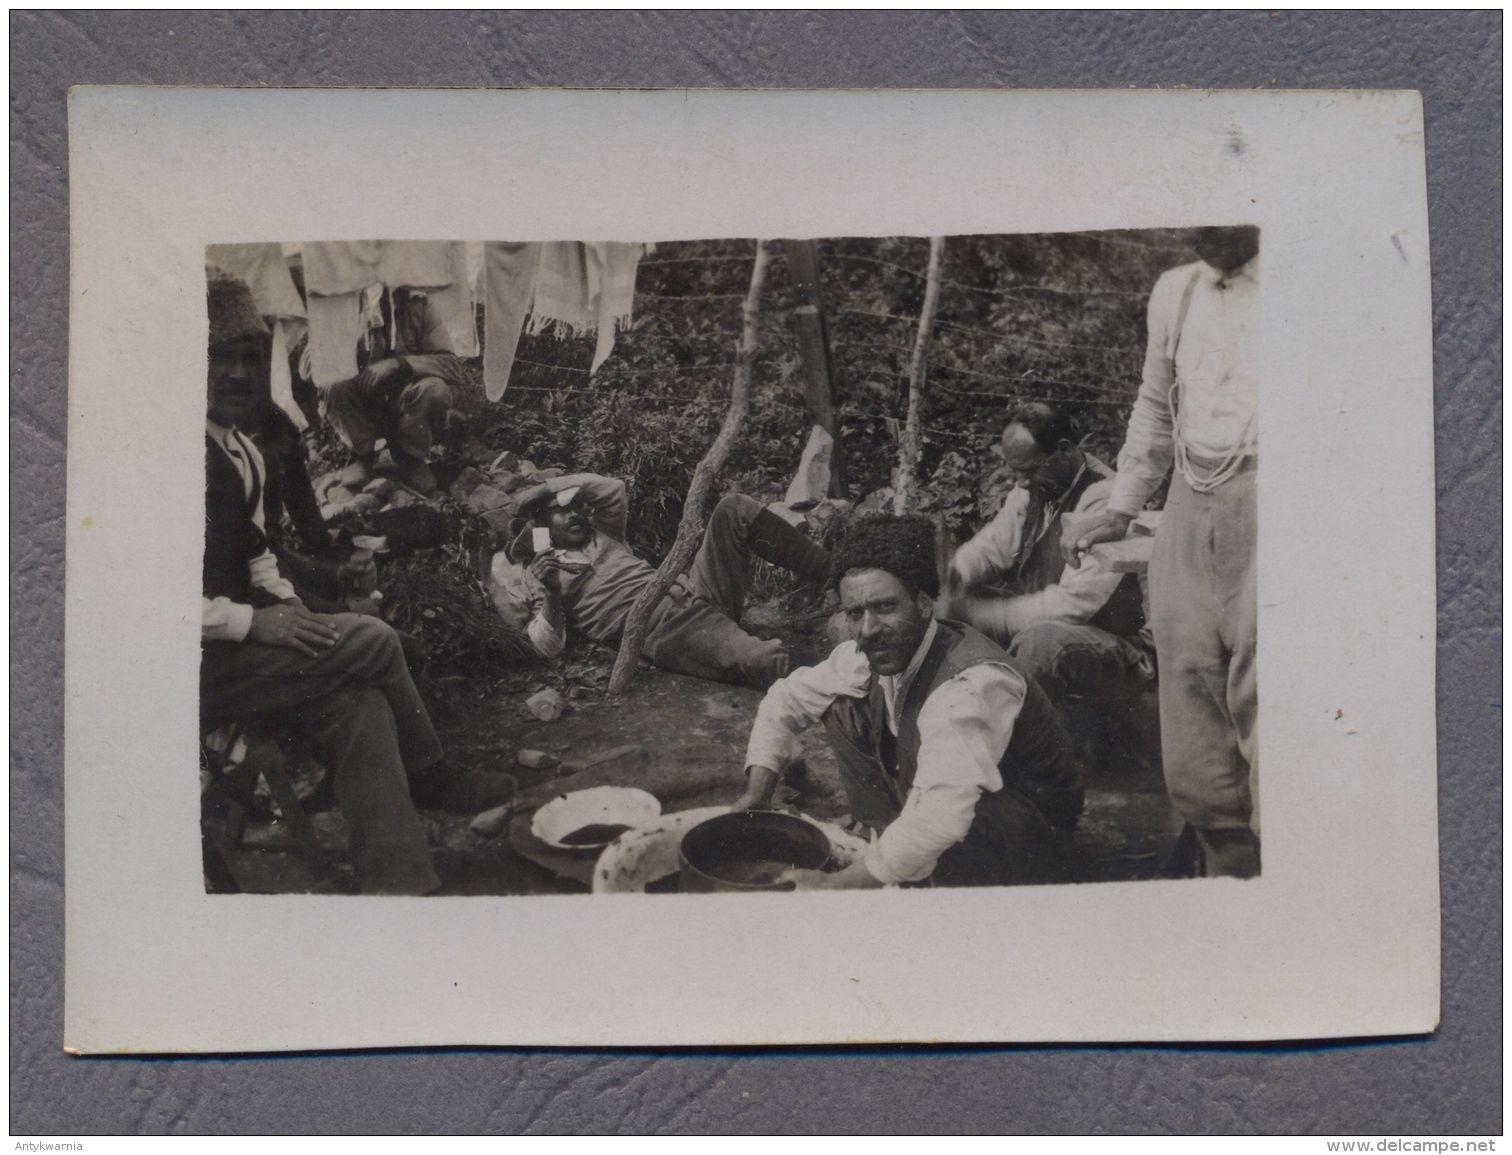 Pervaja Rjecska Pervaya Rietschka VLADIVOSTOK  Turkish ? prisoners   Captive camp   1920y.  Photo      C530